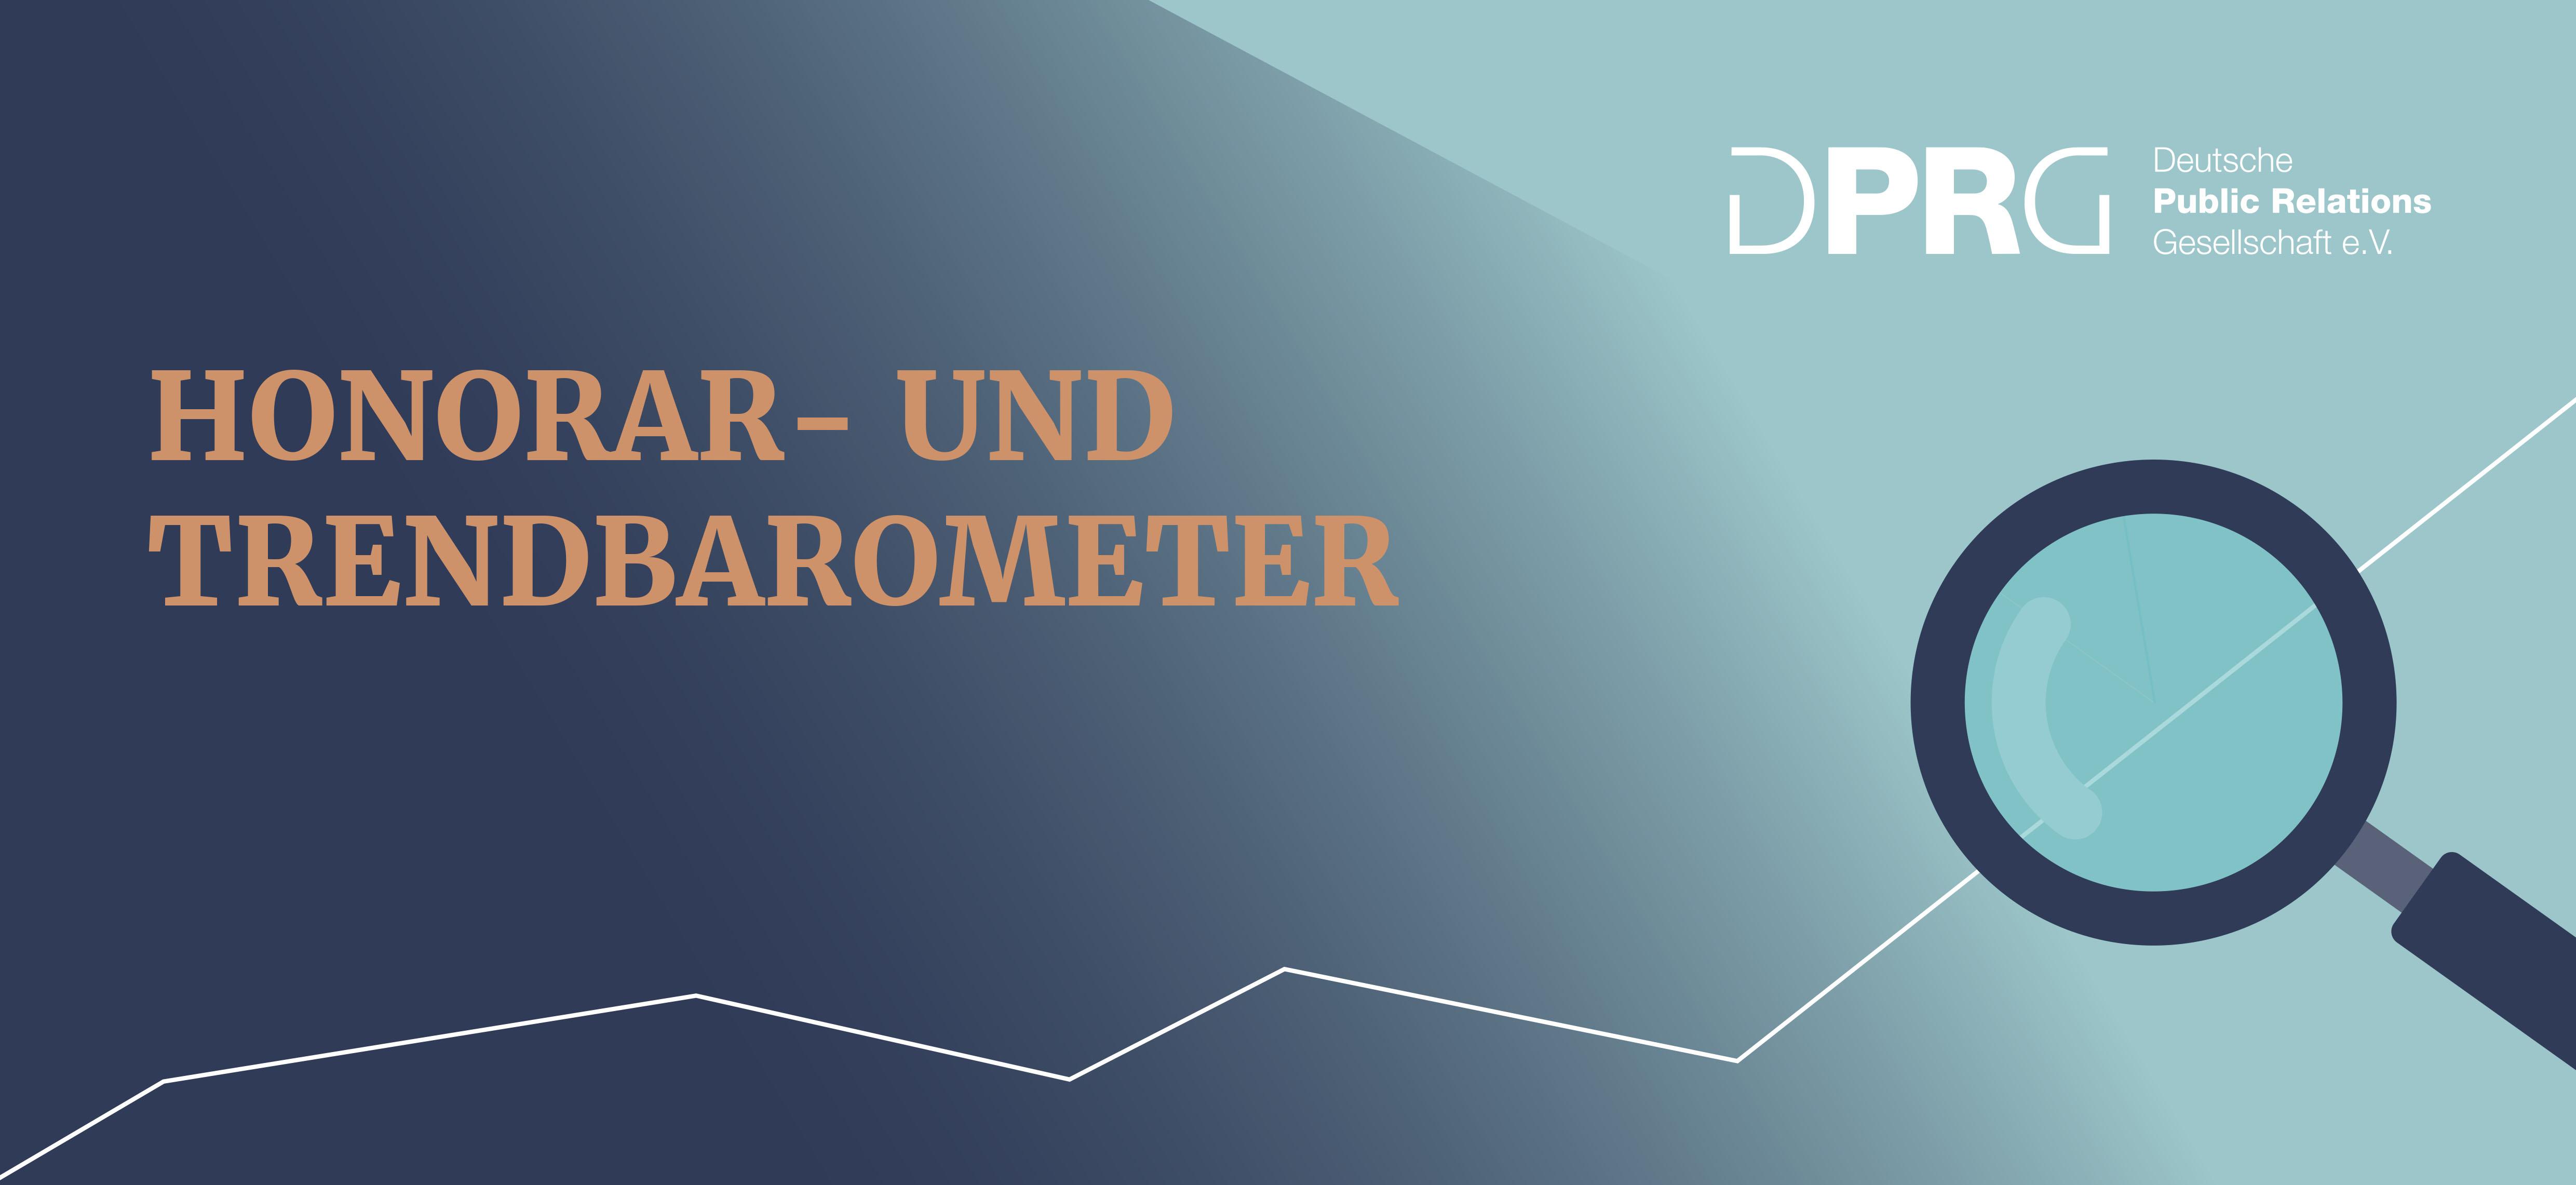 DPRG: Honorar- und Trendbarometer